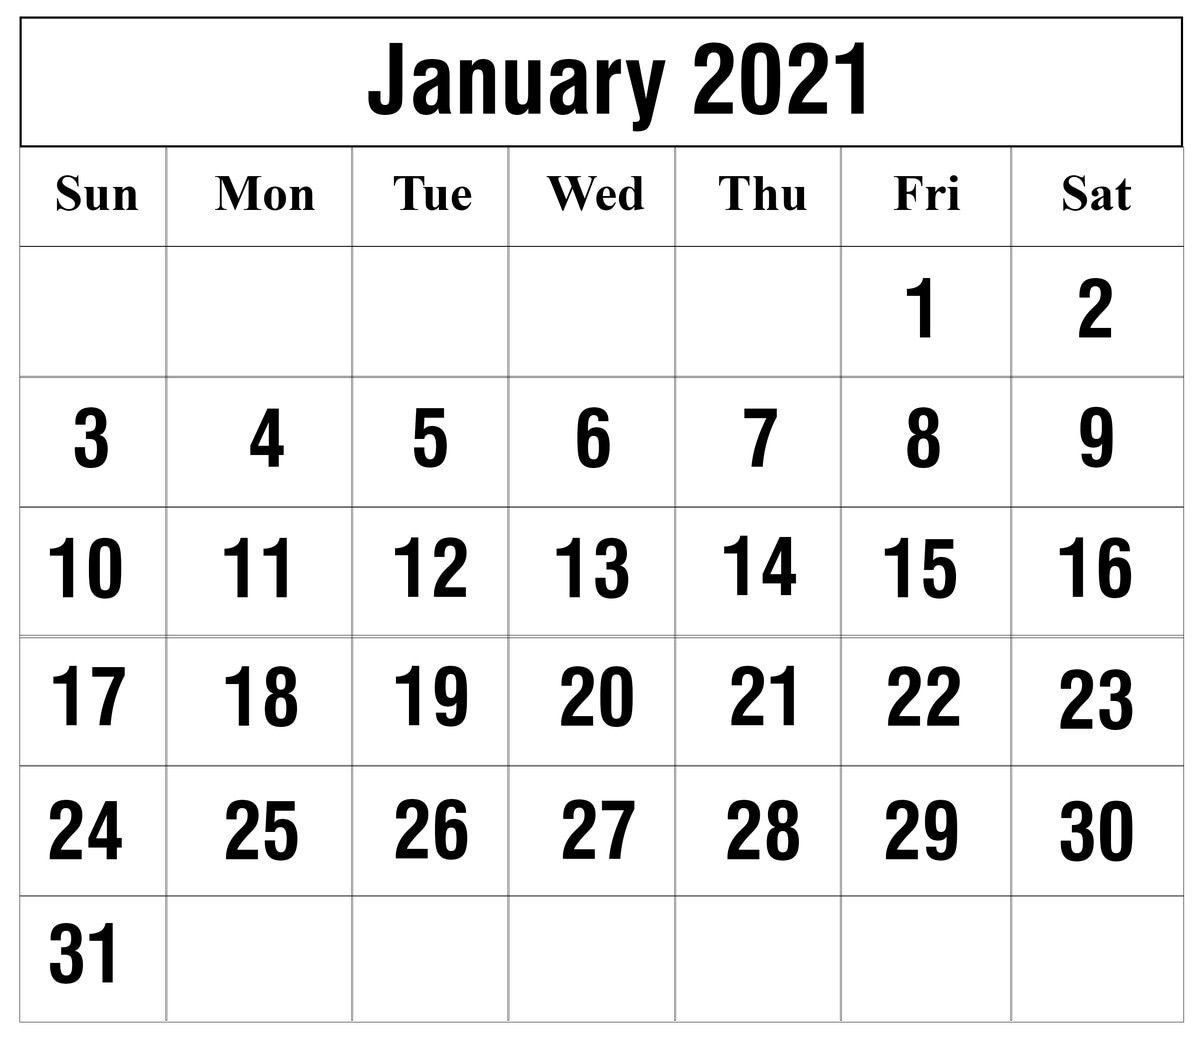 Calendar For January 2021 Project In 2020 | Calendar